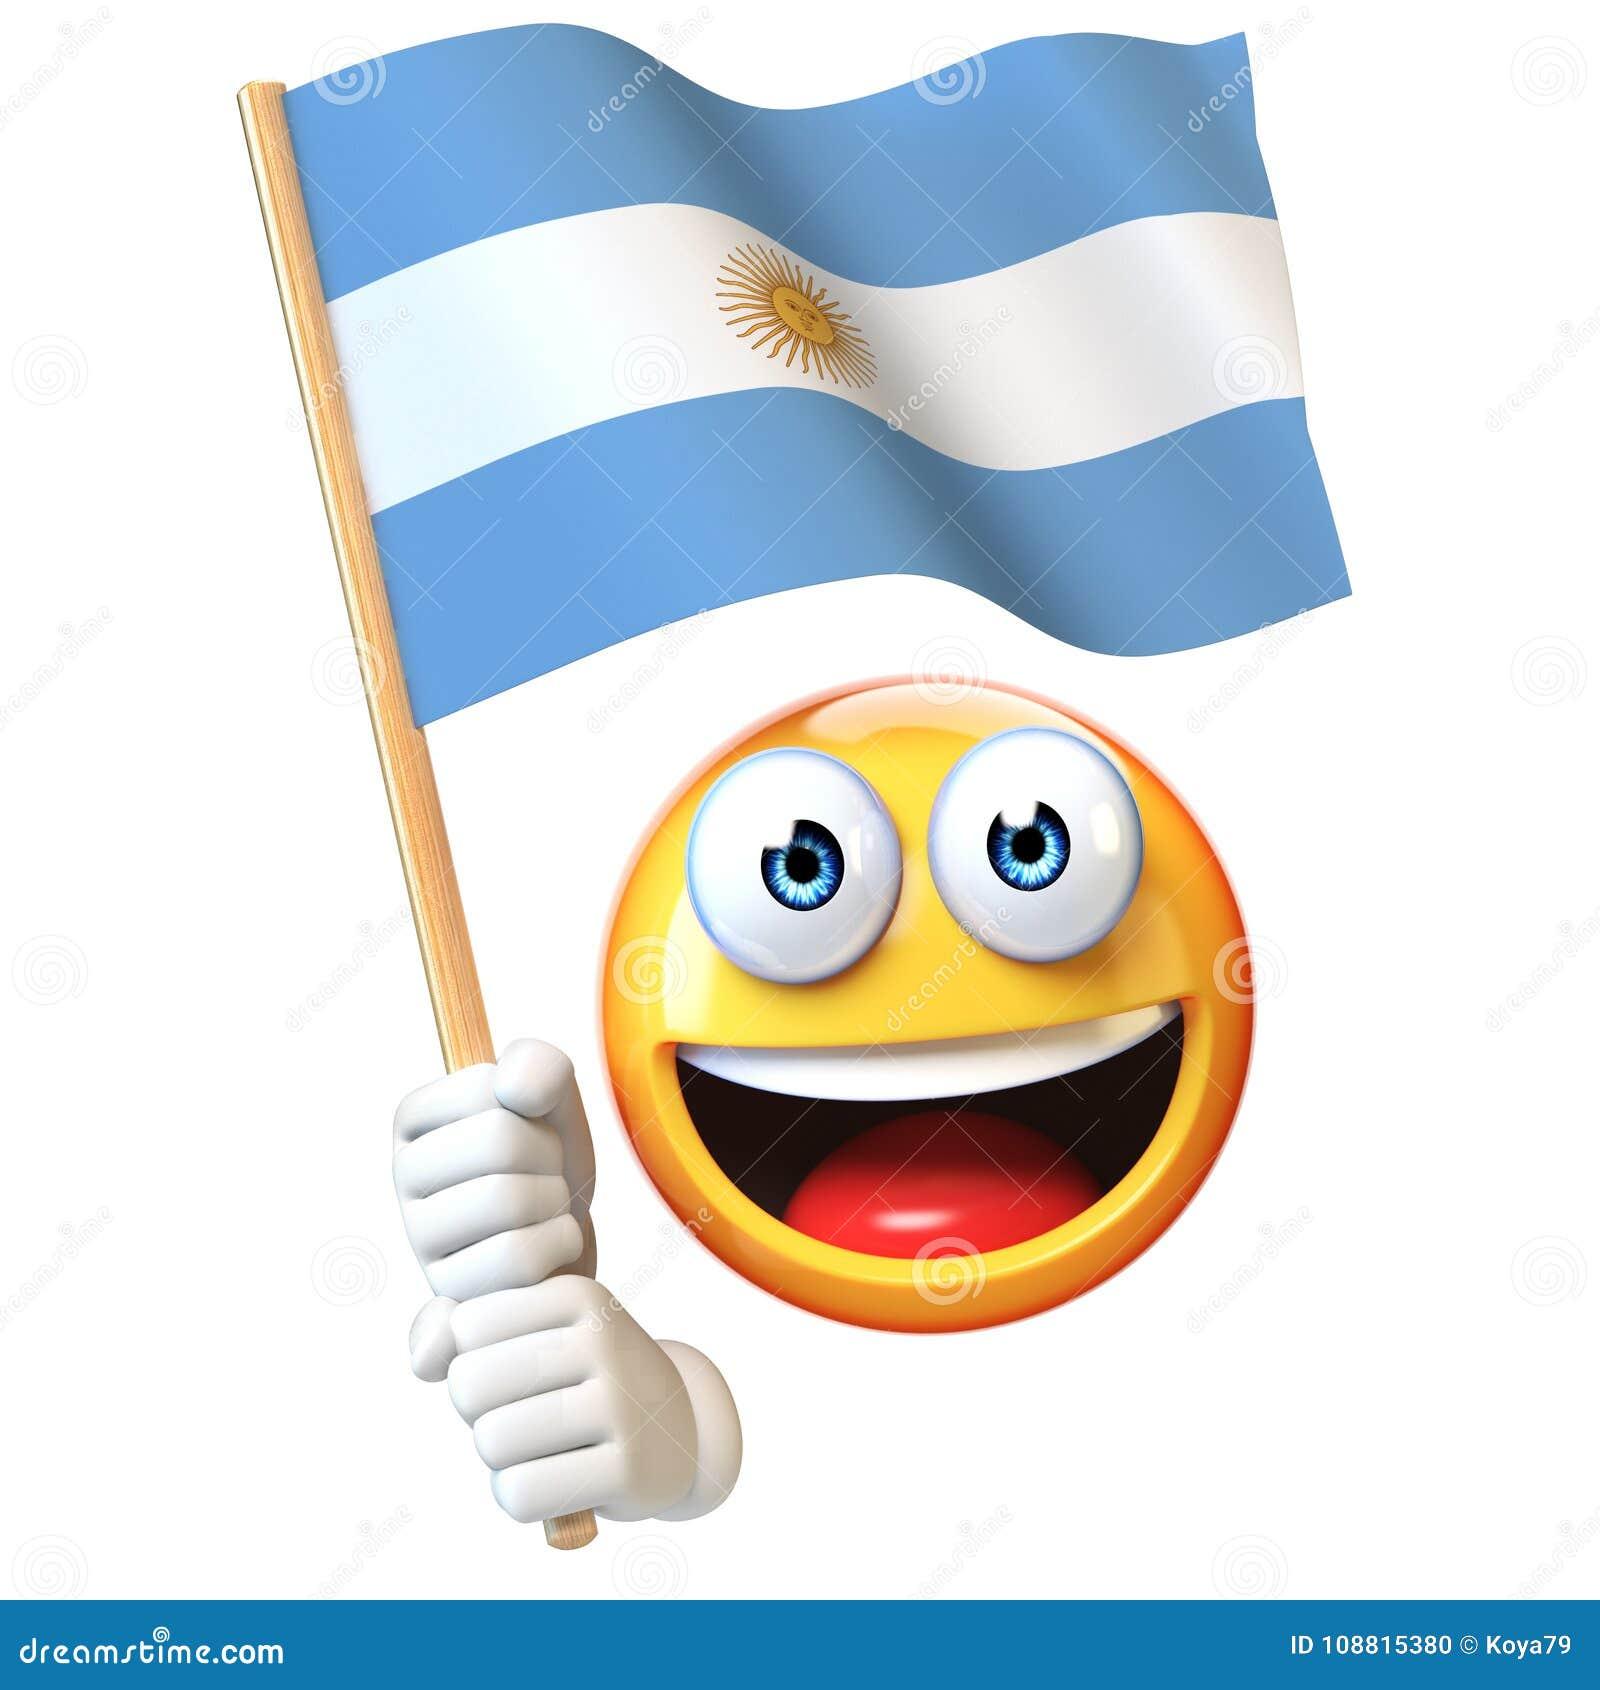 Emoji που κρατά την αργεντινή σημαία, emoticon κυματίζοντας εθνική σημαία της τρισδιάστατης απόδοσης της Αργεντινής